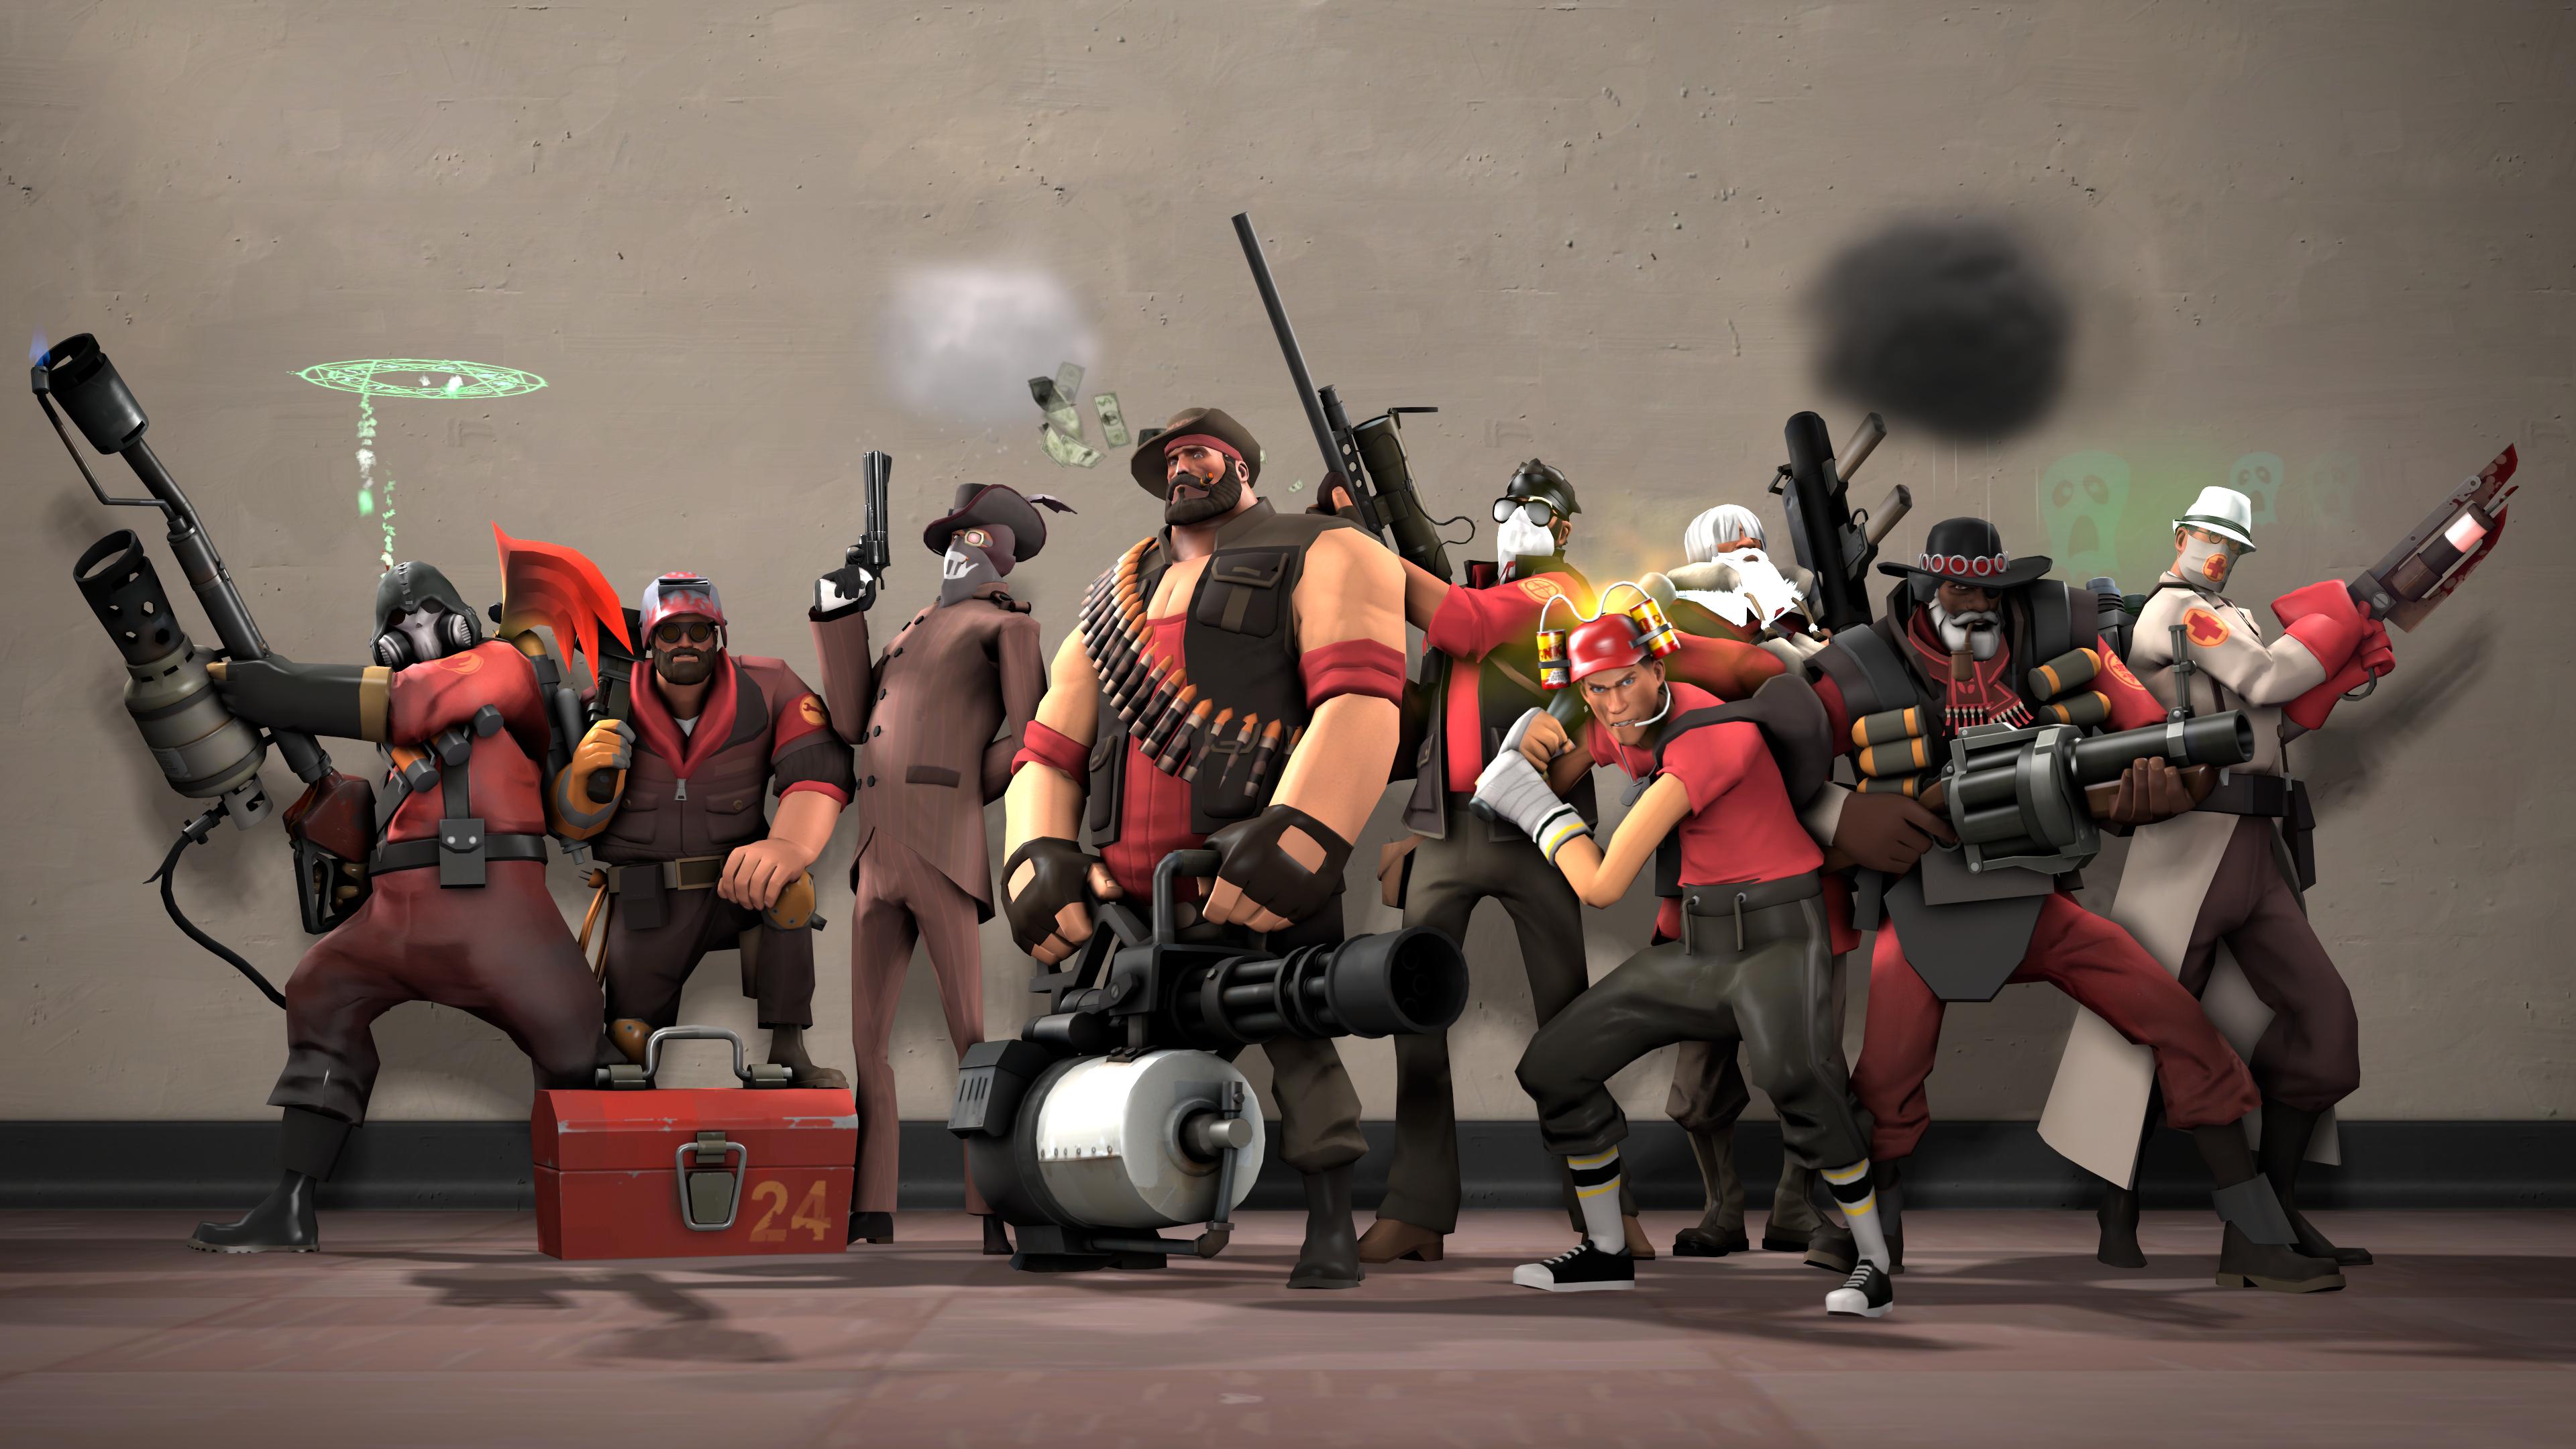 Odigravanje raketnih liga